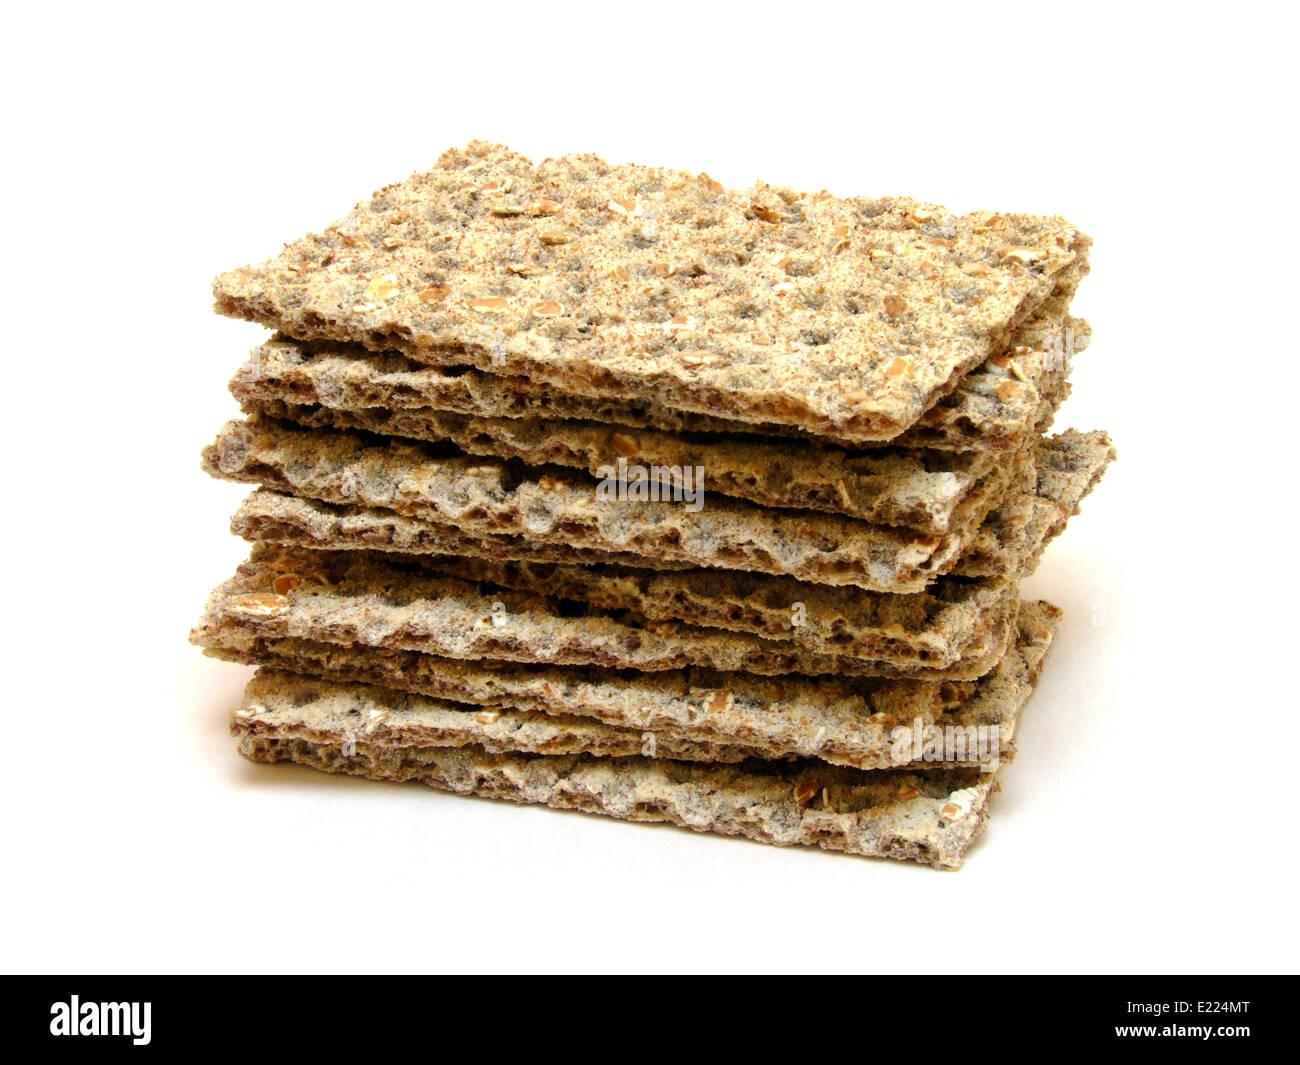 Crispbread - Stock Image